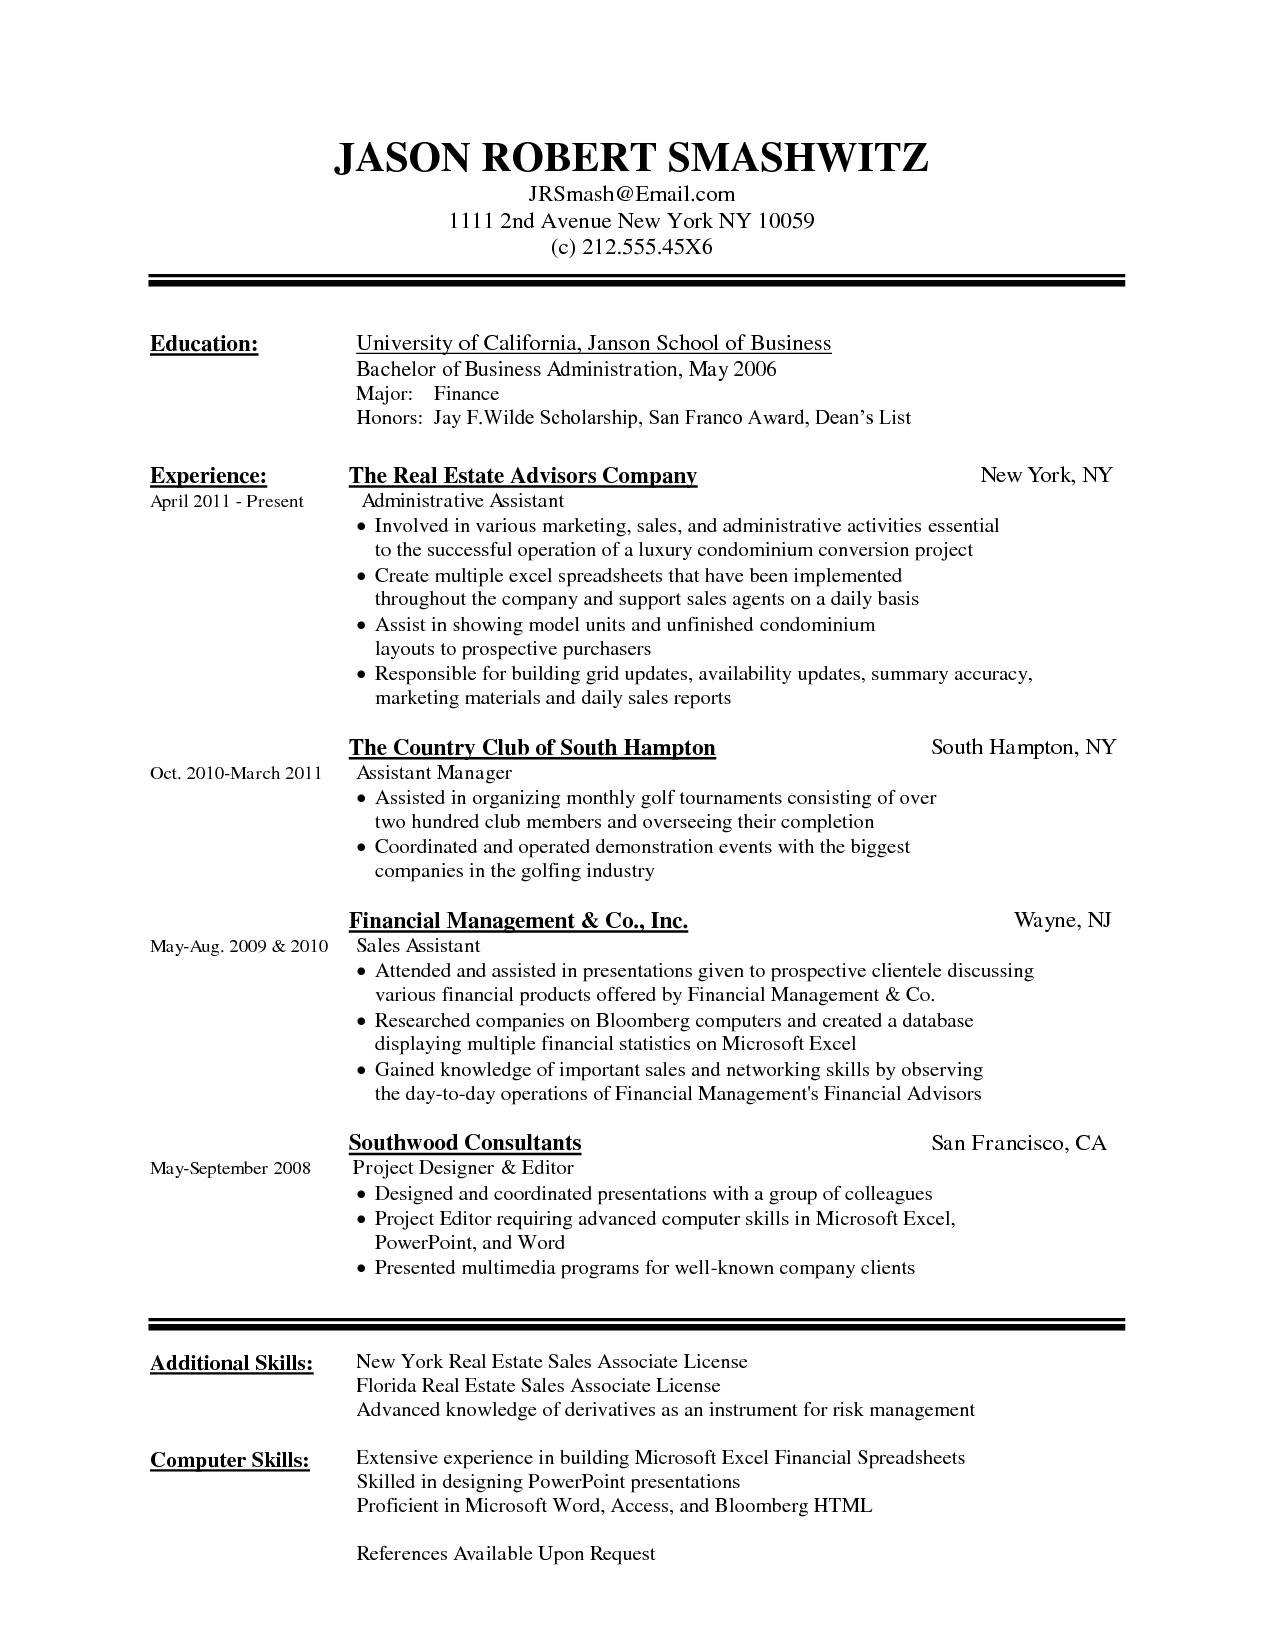 Microsoft Word Resume Templates  Task List Templates